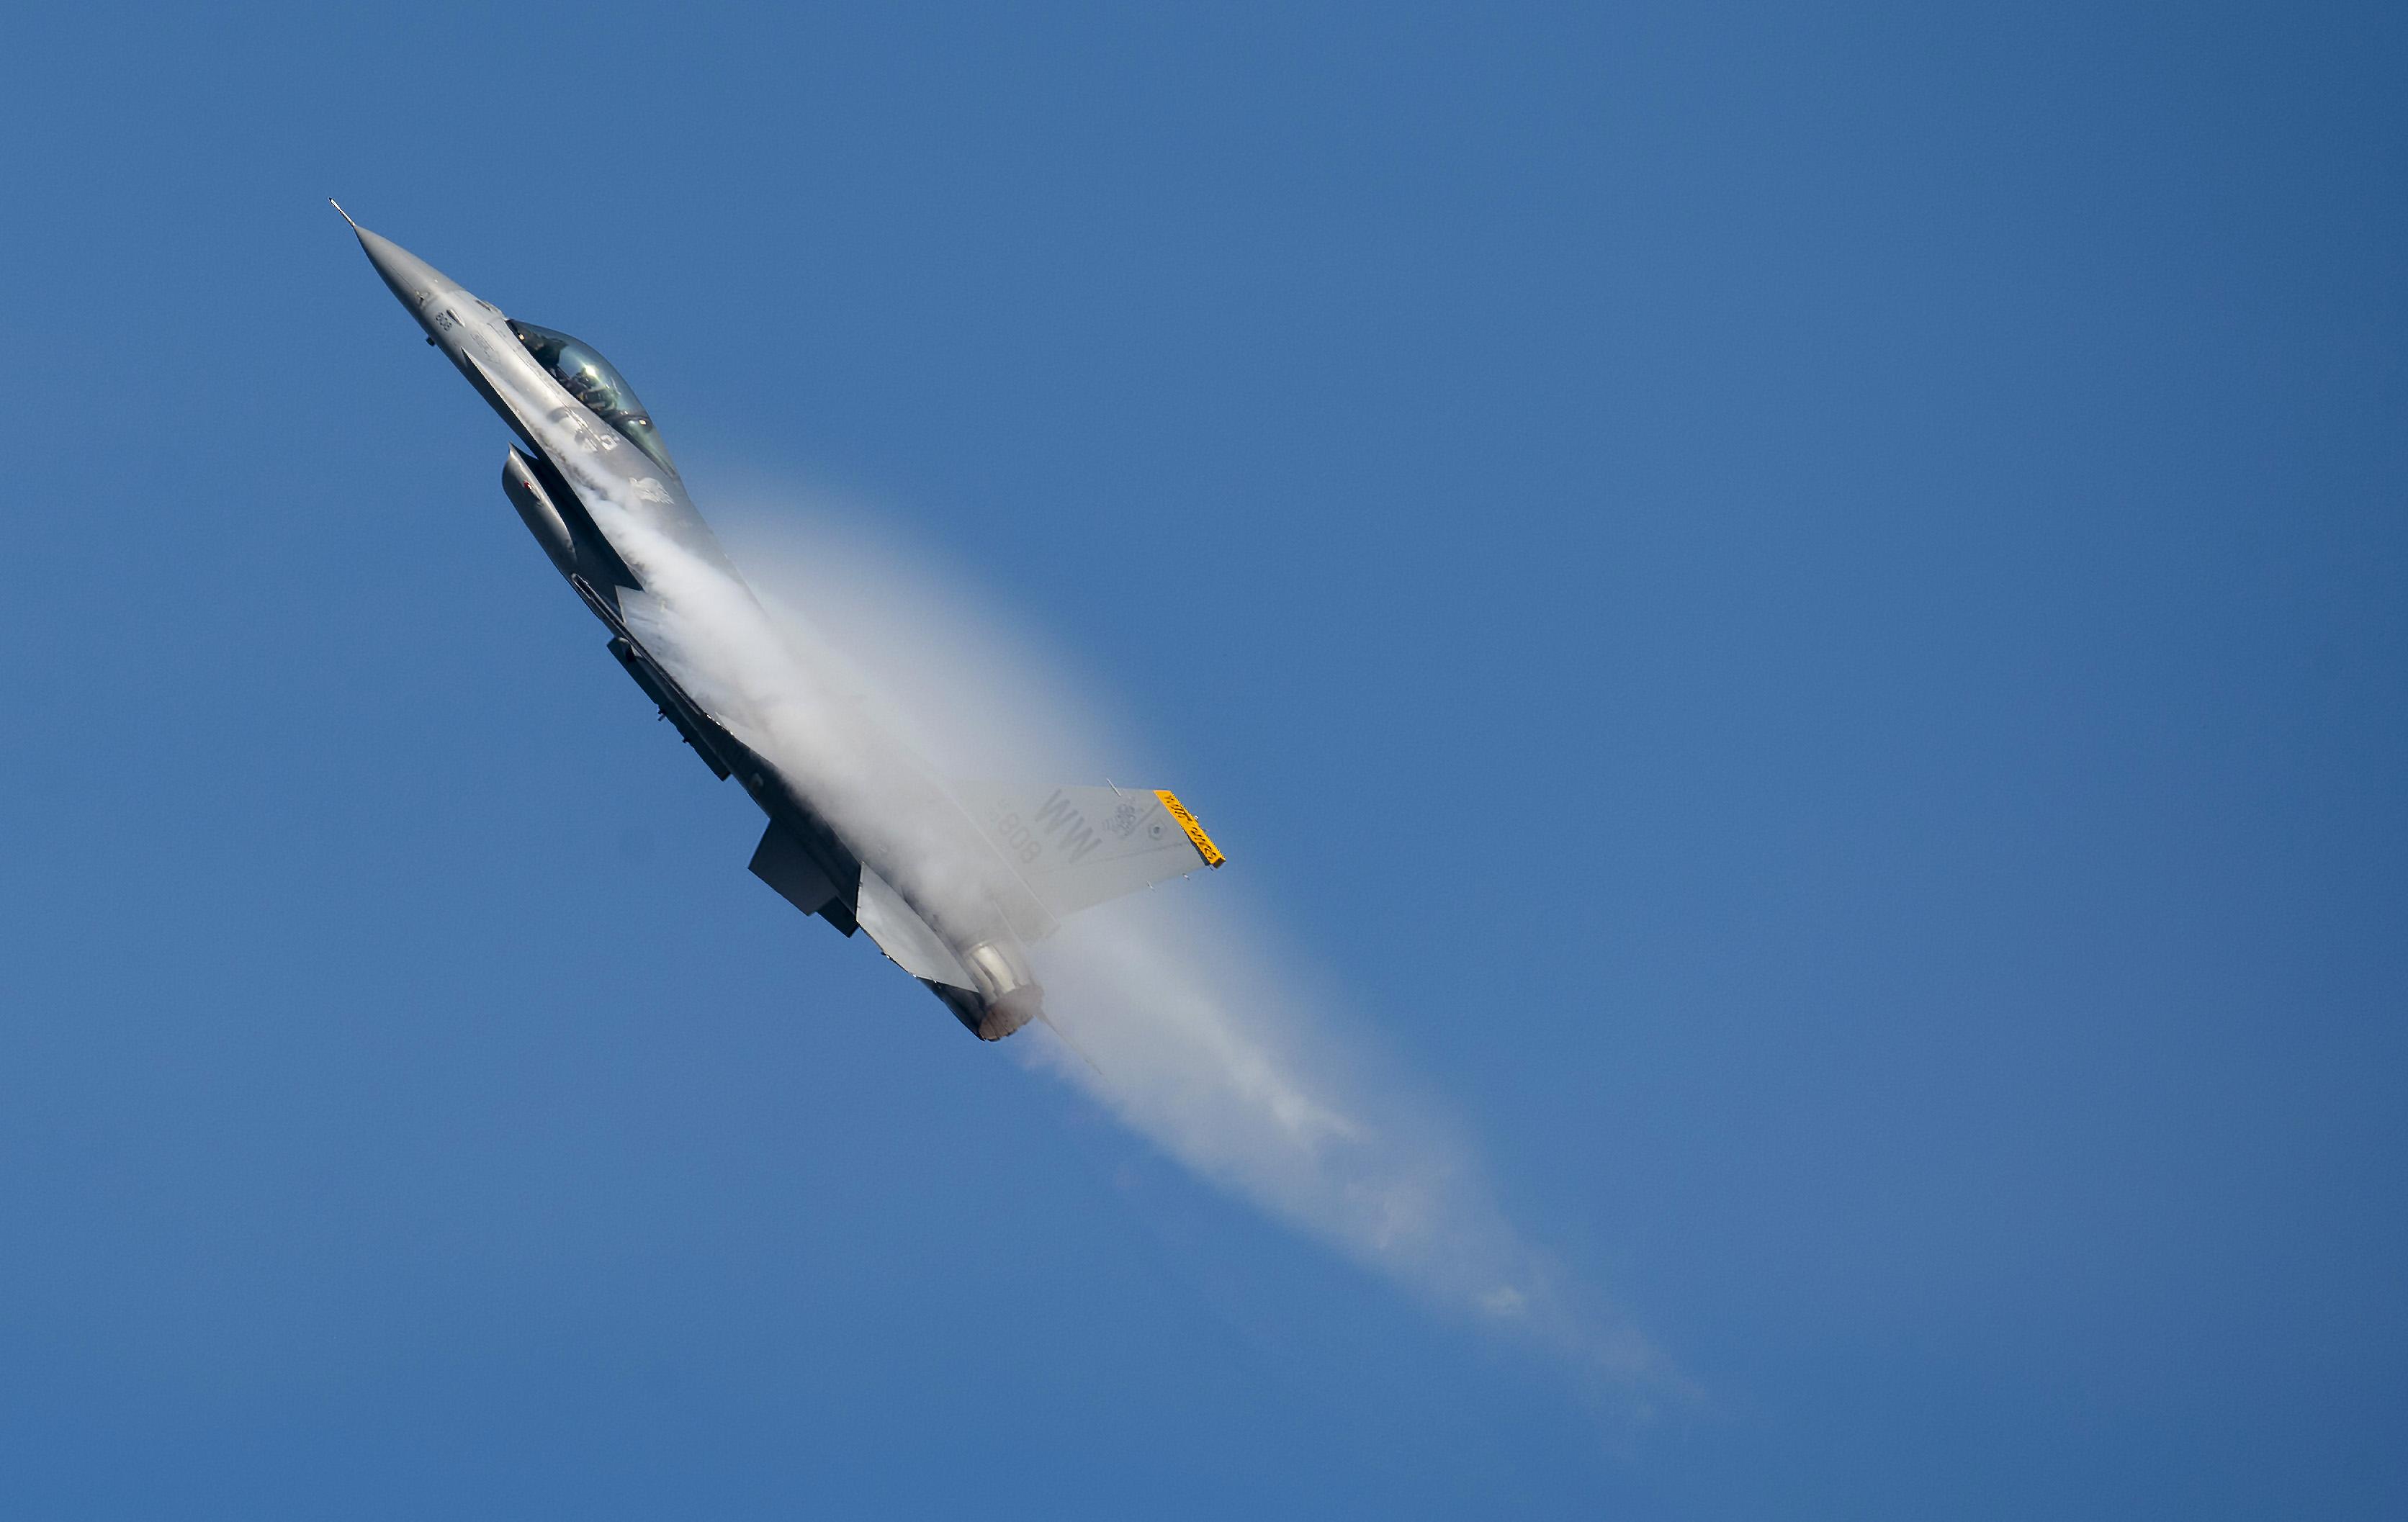 F-16 PACAF Viper Demo team